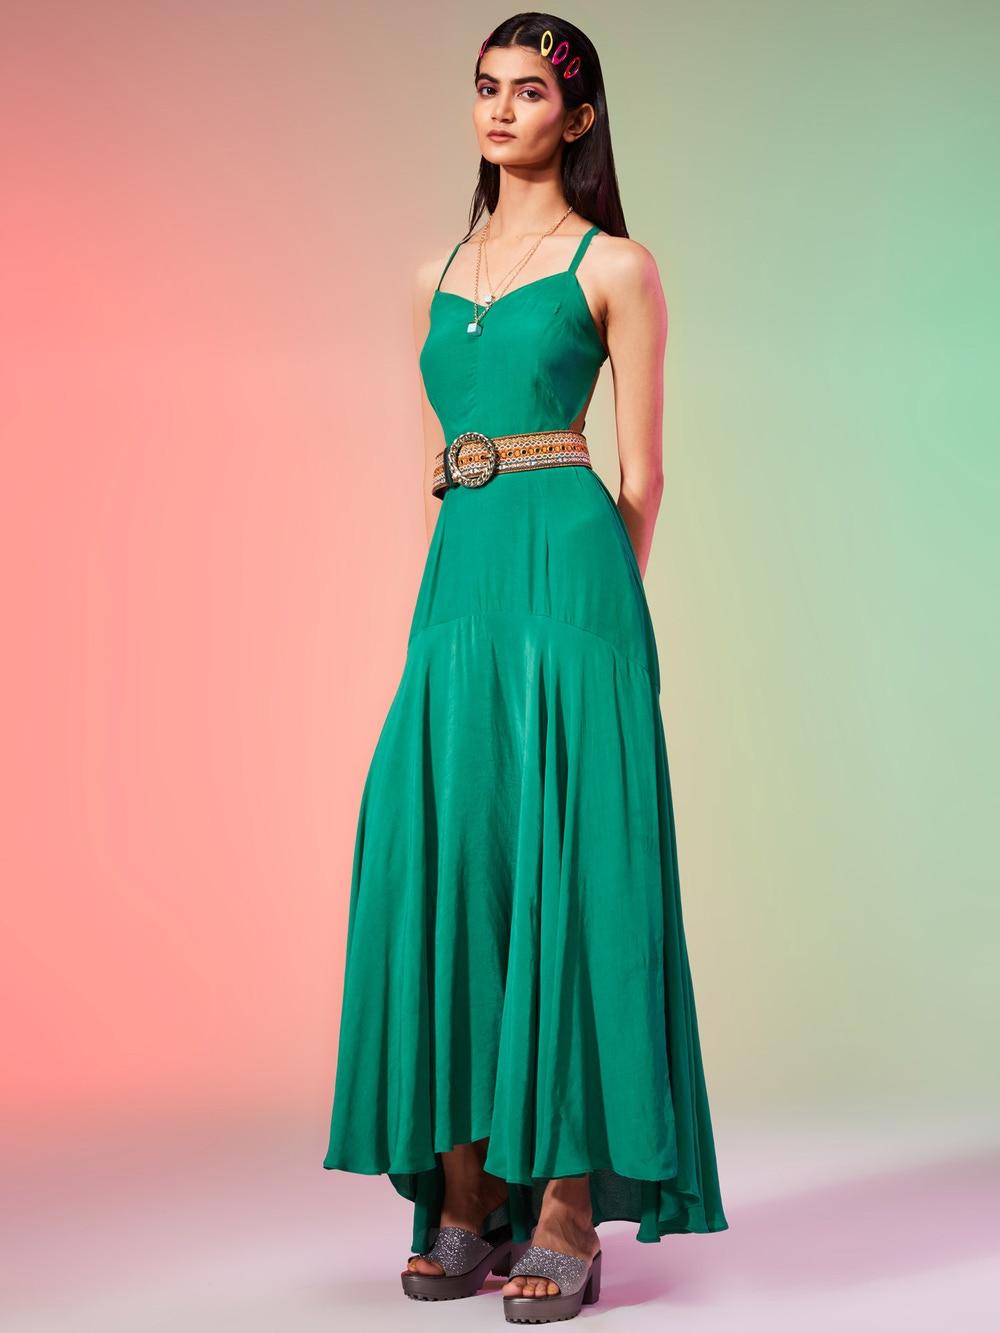 Teal Green Crepe Halter Maxi Dress